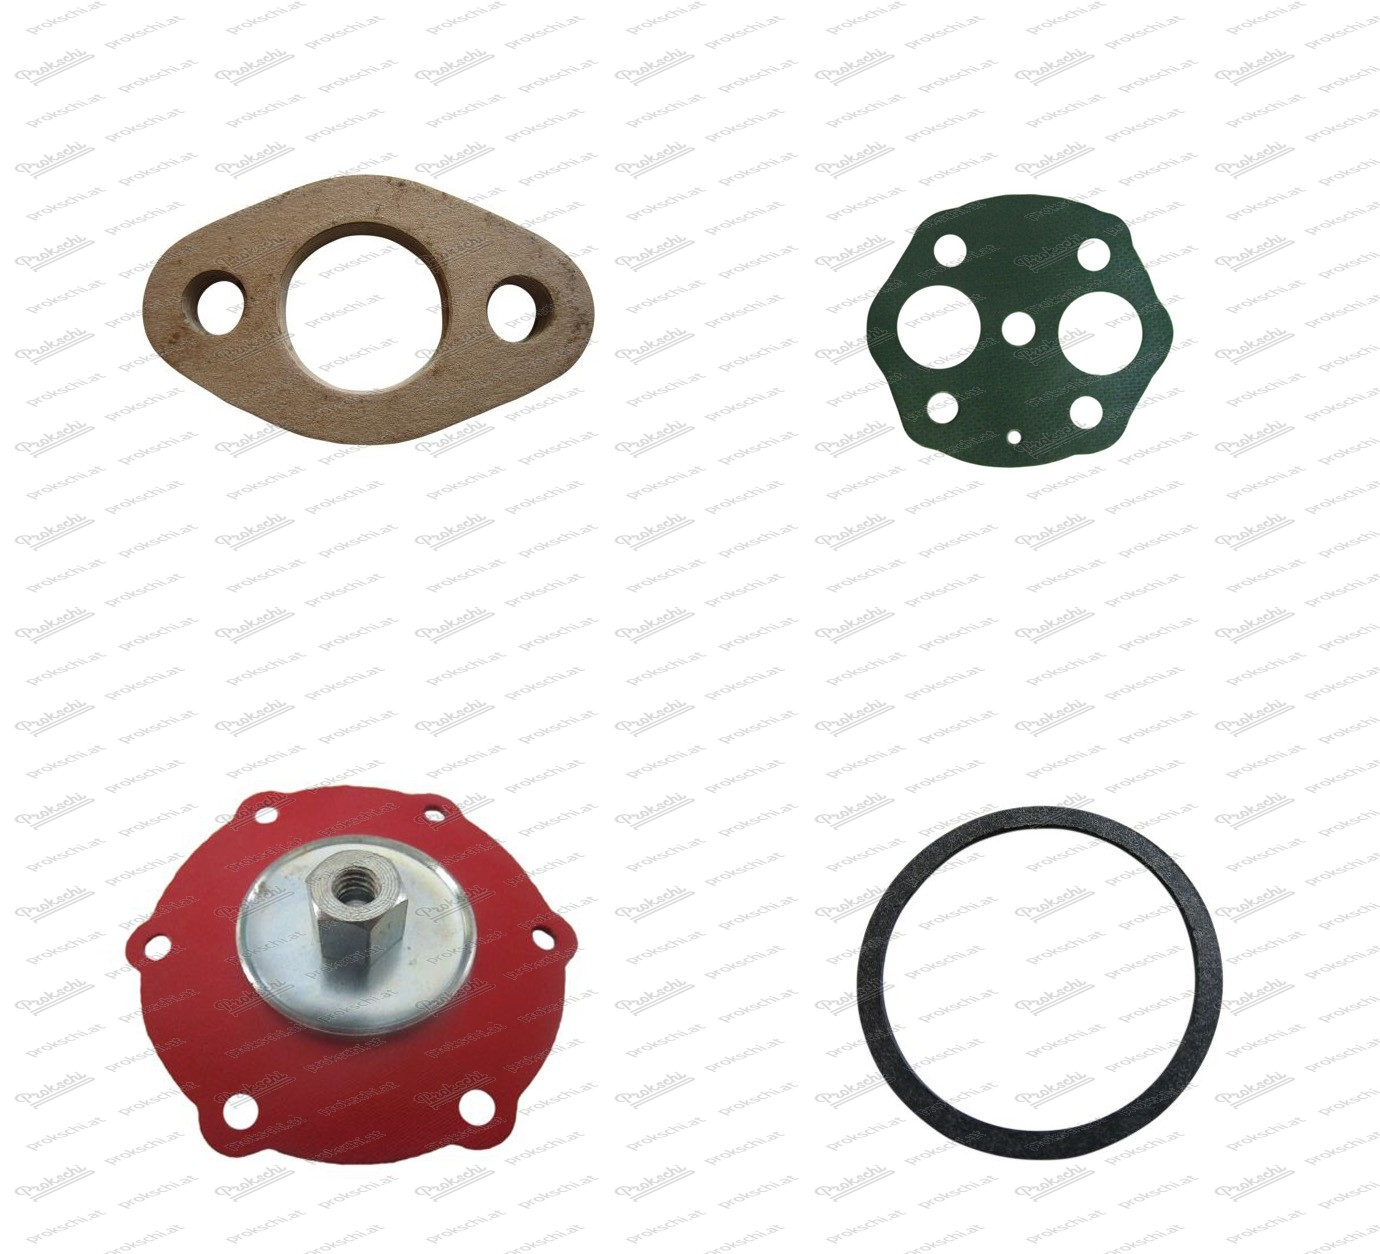 Benzinpumpen-Wartungs-Kit SOLEX PE14630 / PK11280